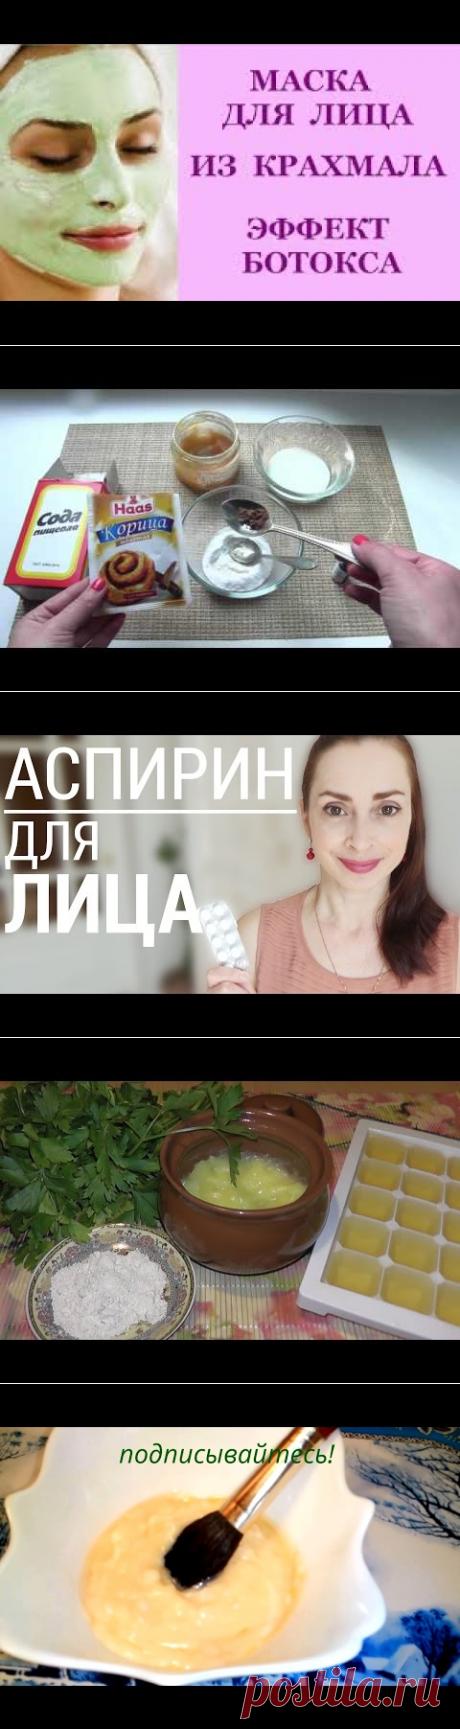 МАСКА ОТ МОРЩИН С АСПИРИНОМ ТВОРИТ ЧУДЕСА 3.12.2017 - YouTube